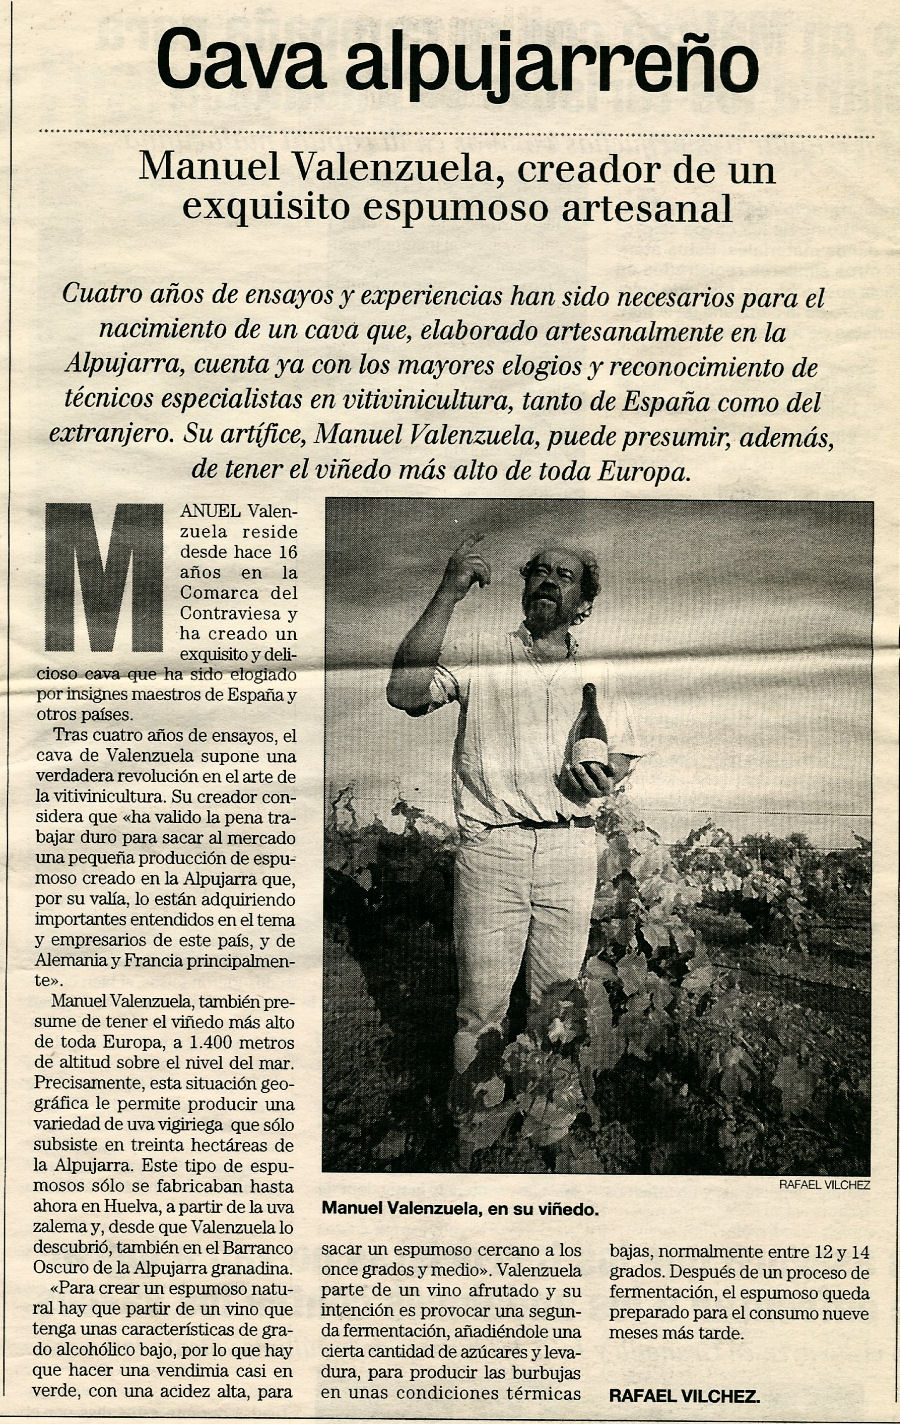 Cava alpujarreño. Manuel Valenzuela, creador de un exquisito espumoso artesanal (Ideal, 14/07/1996)